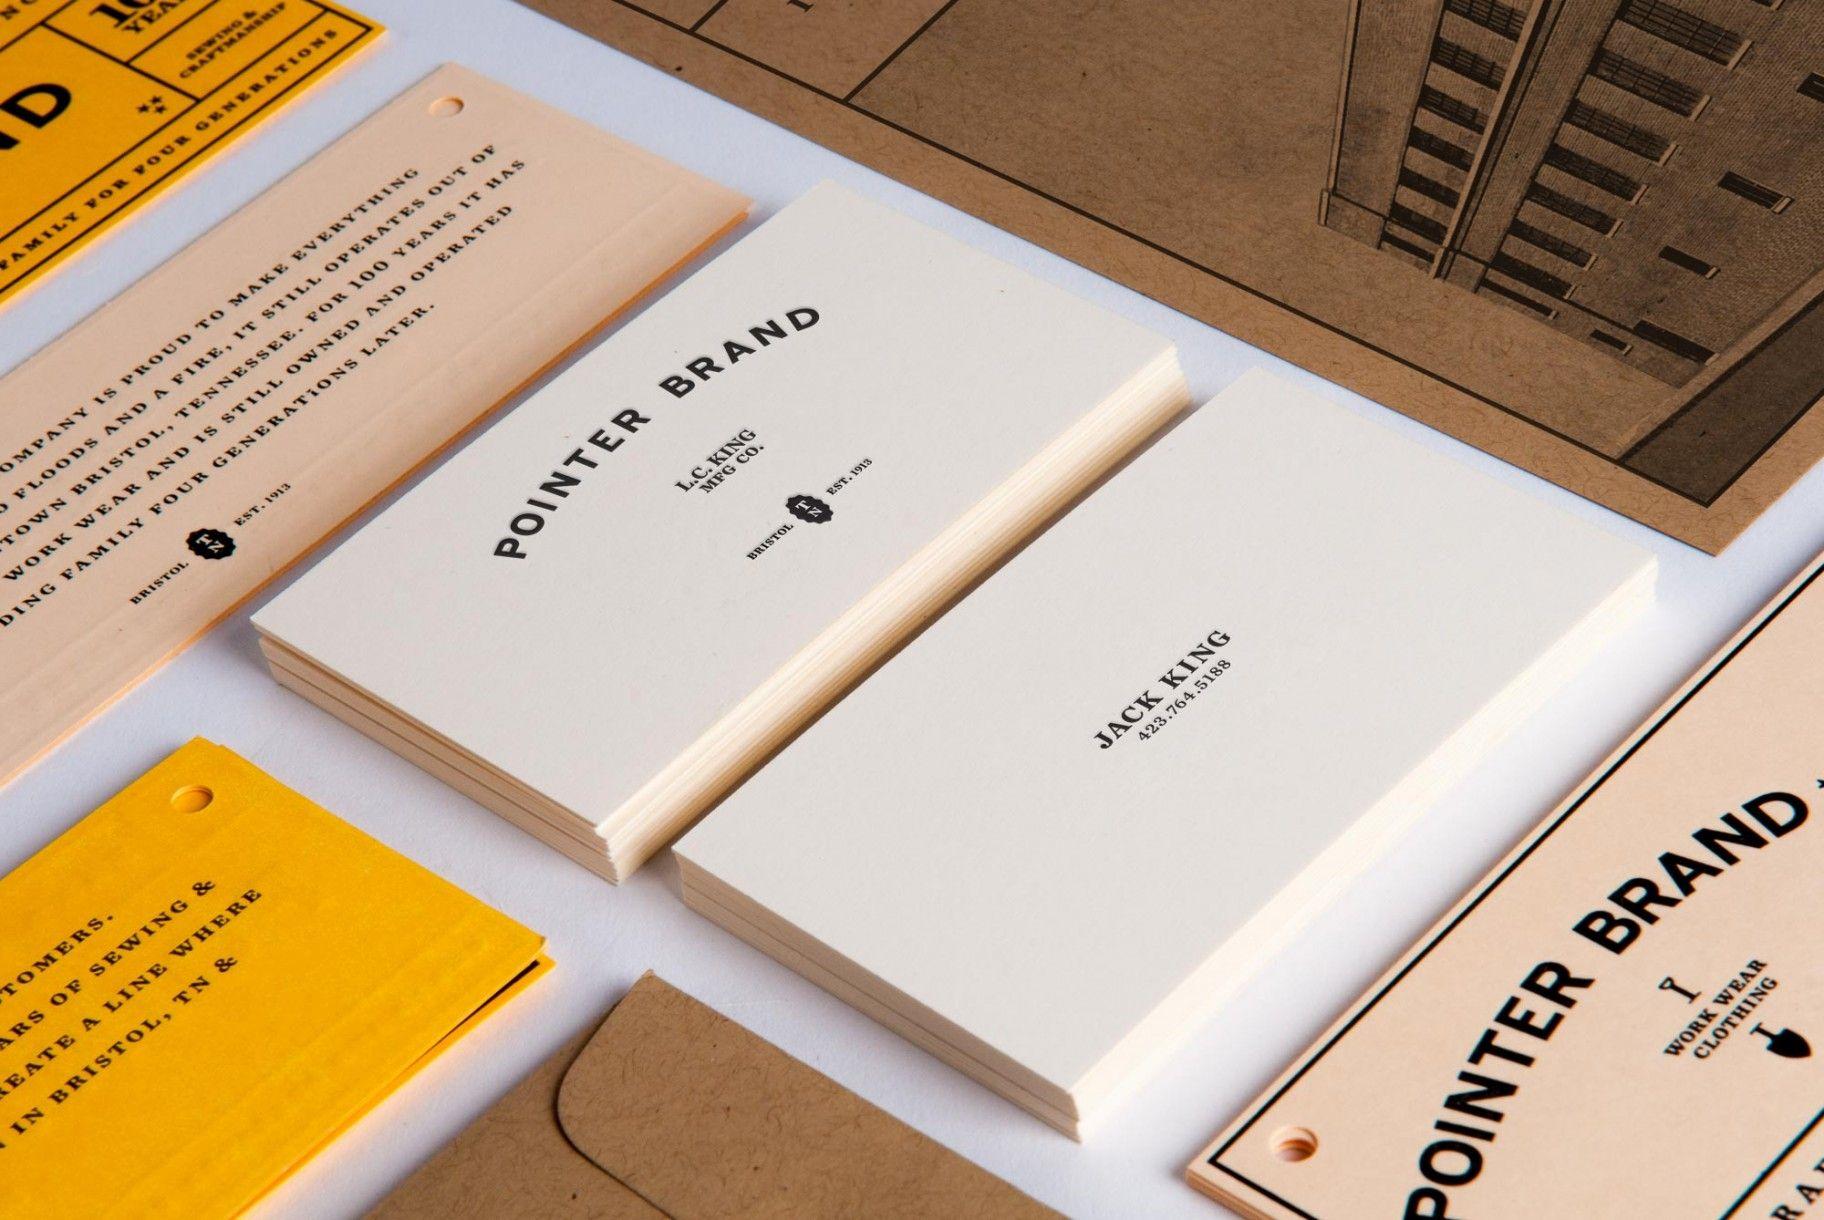 Gorgeous Branding By Daniel Blackman For Pointer Brand Clothing Print Designs Inspiration Business Card Design Graphic Design Branding